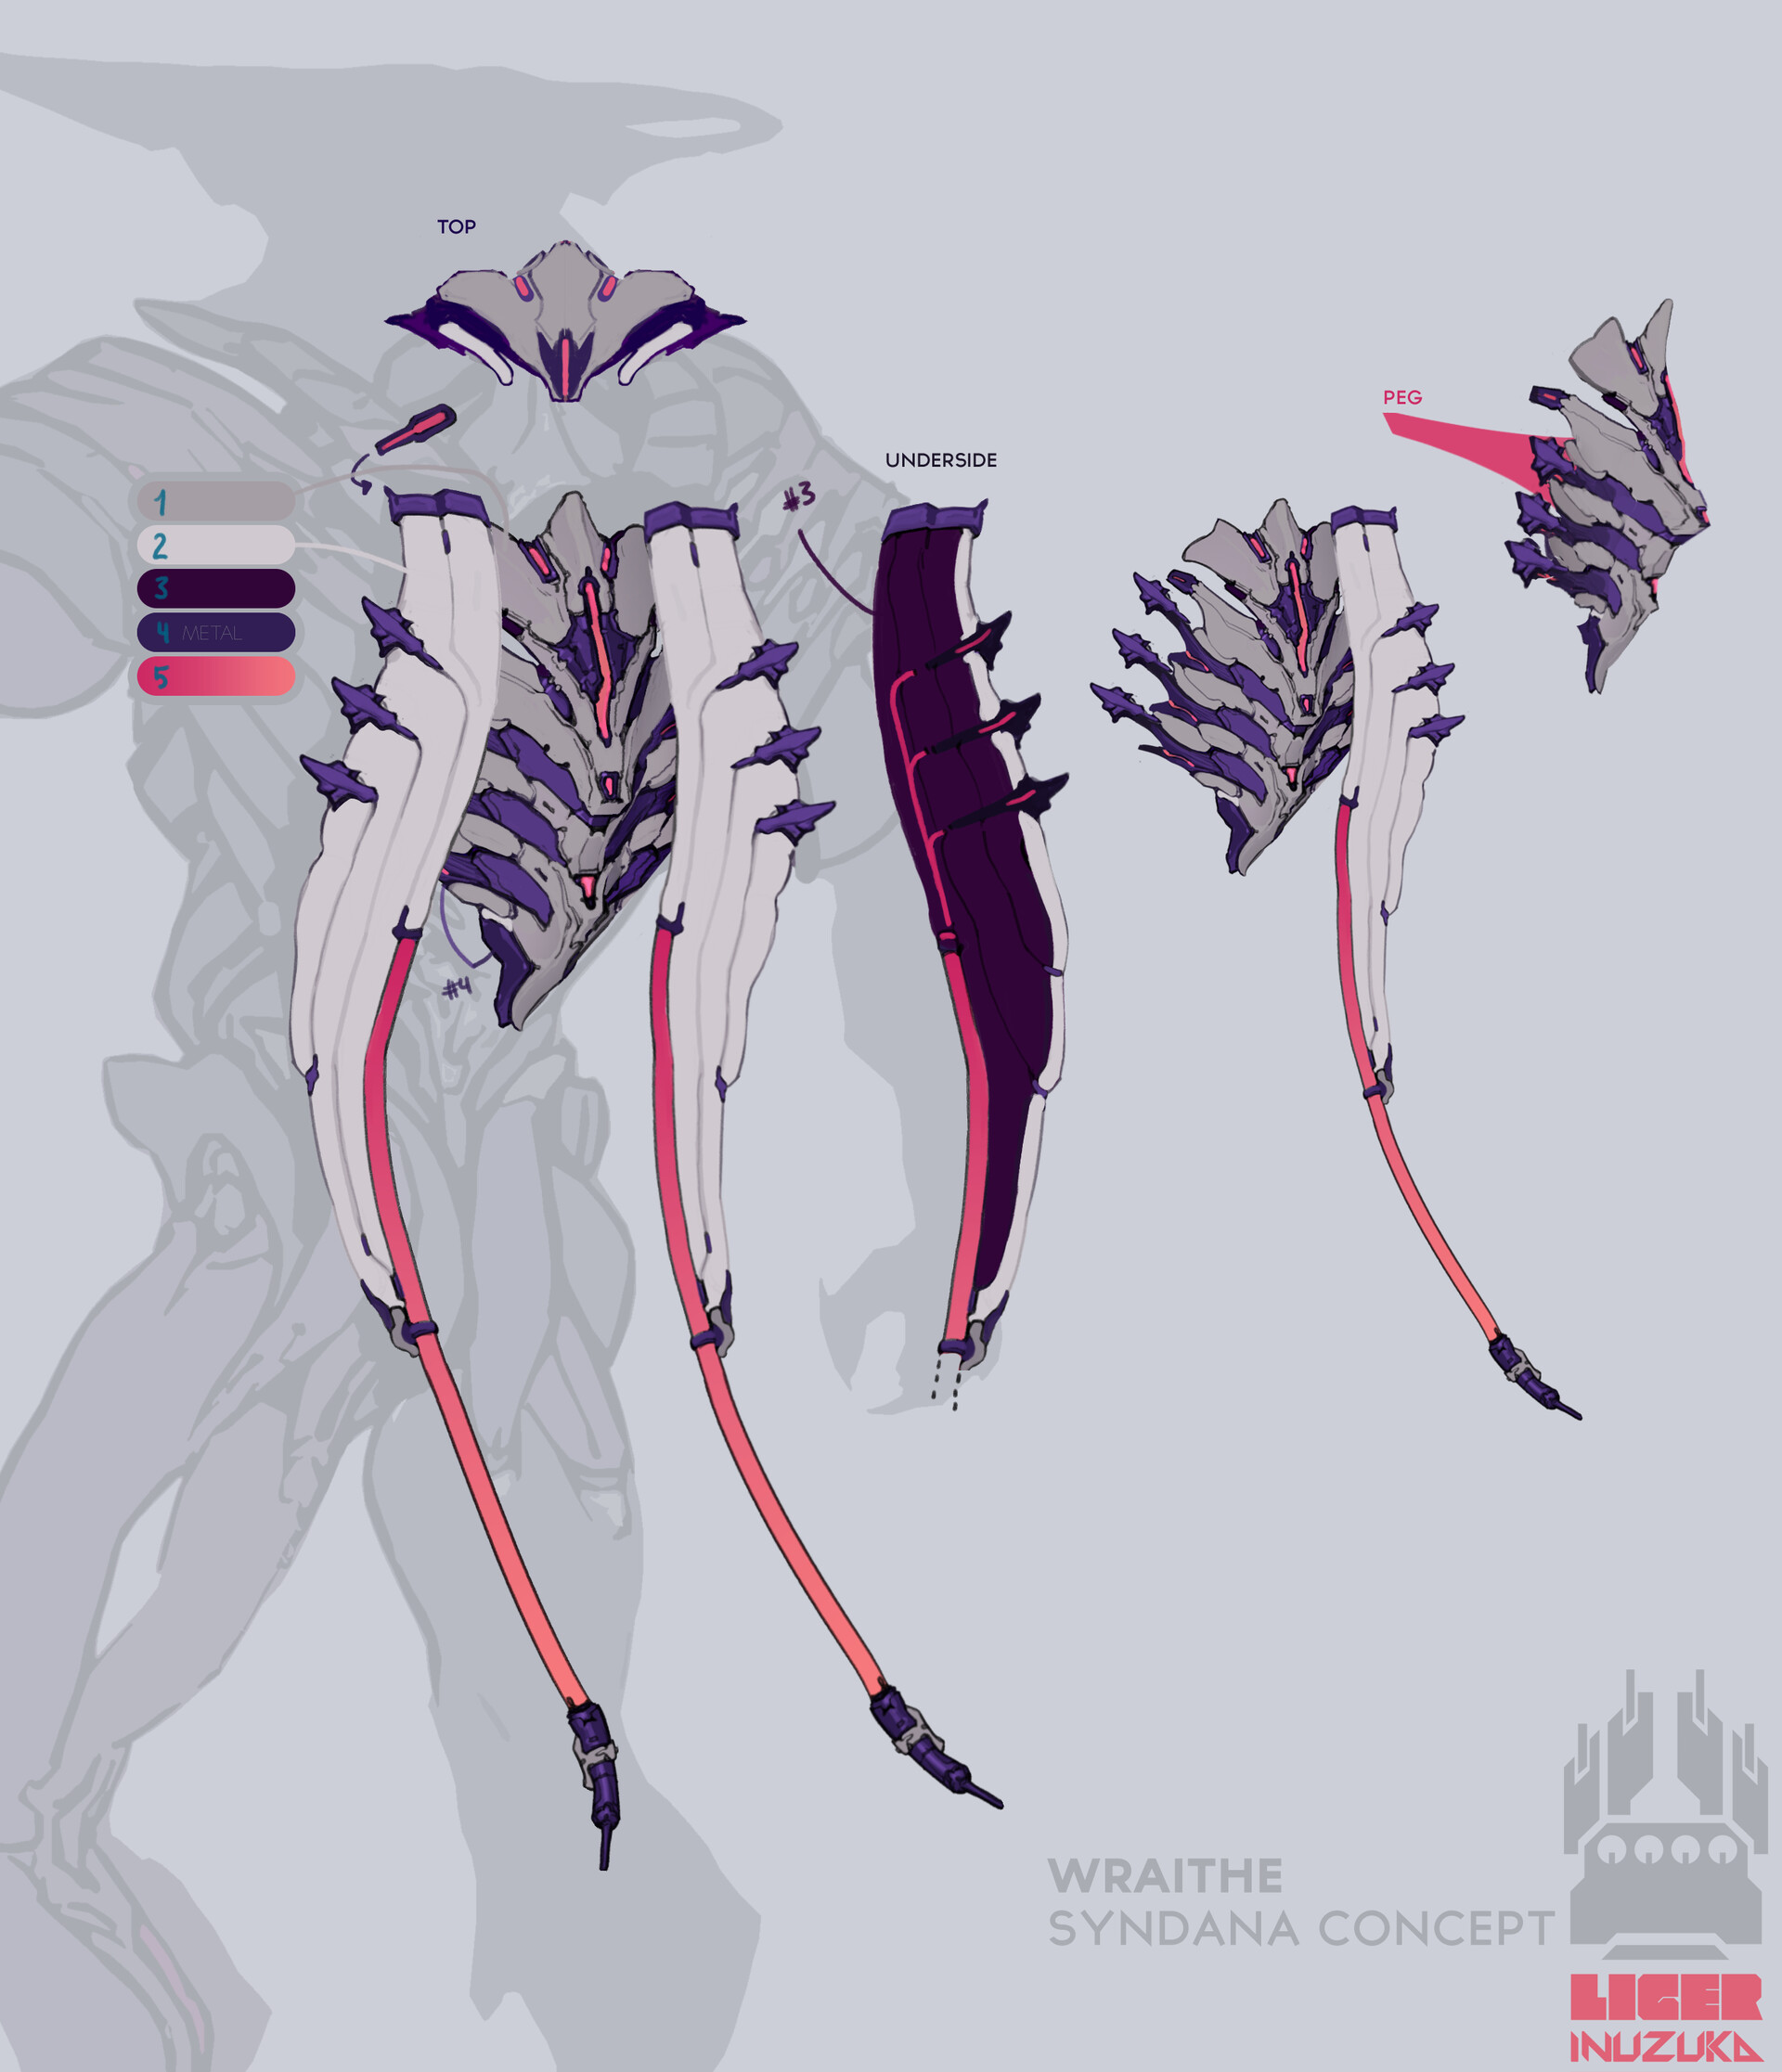 Wraithe's cosmetic syndana